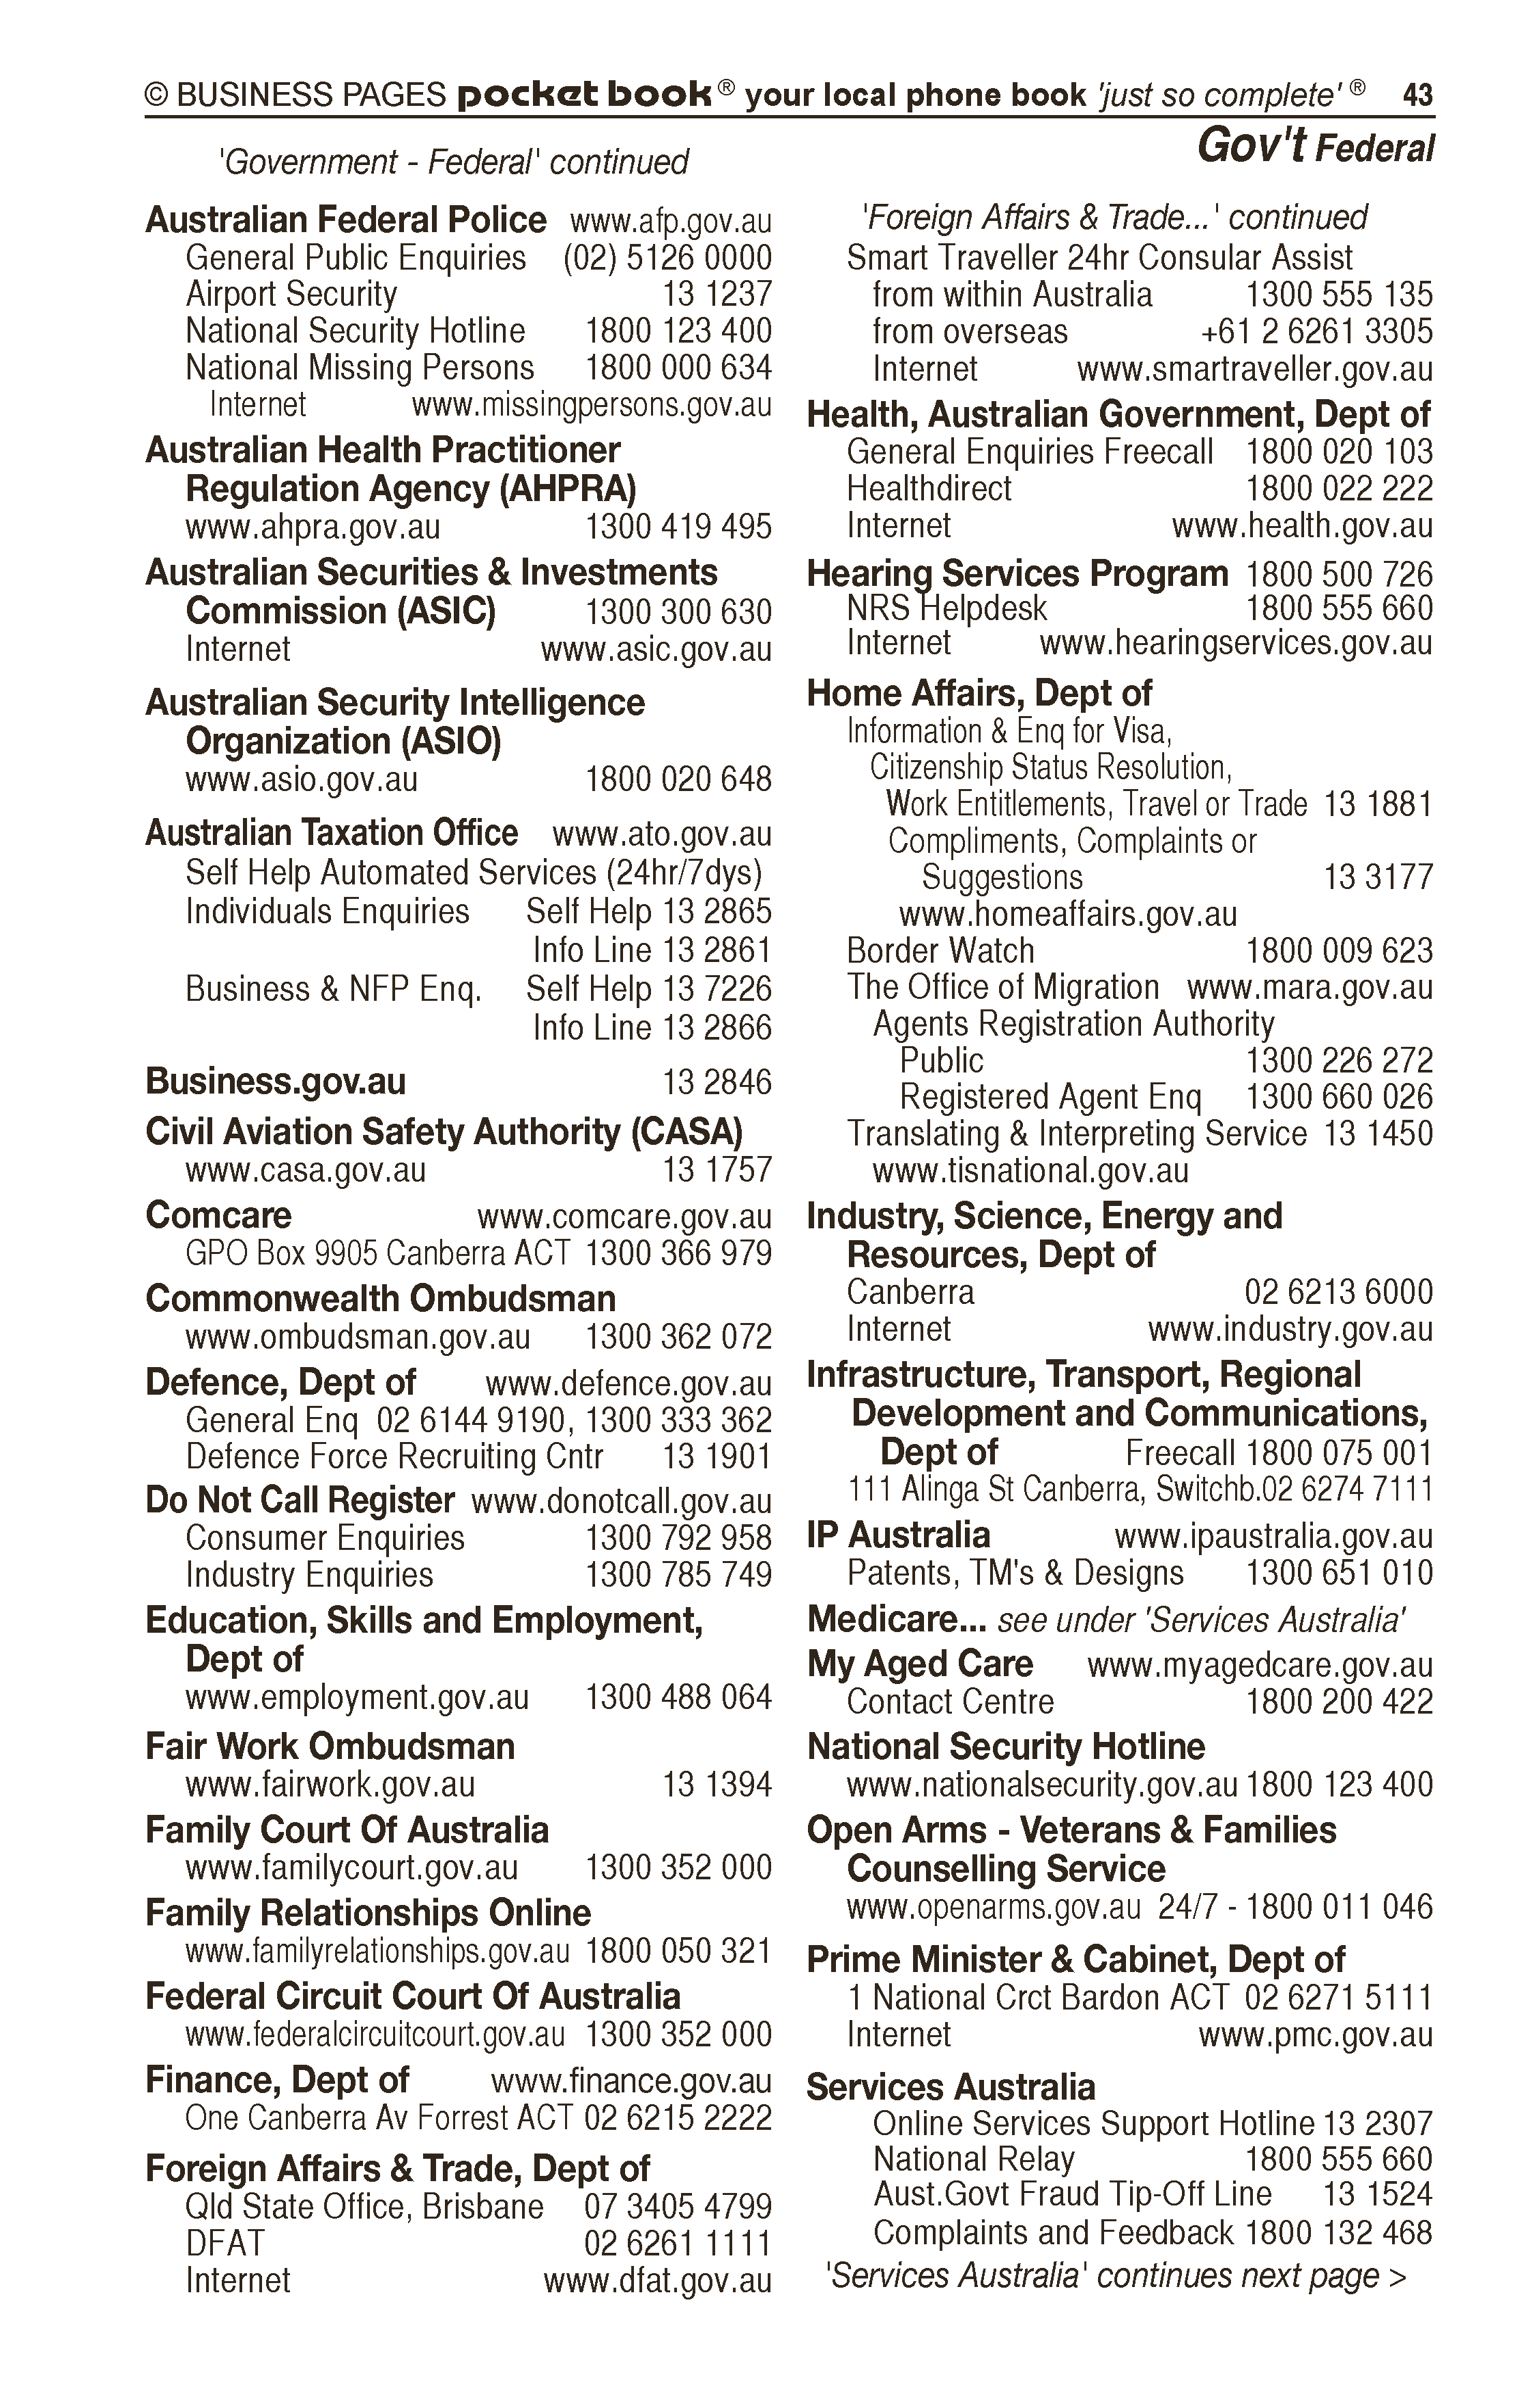 Goondiwindi Engineering P/L in Goondiwindi QLD - page 43